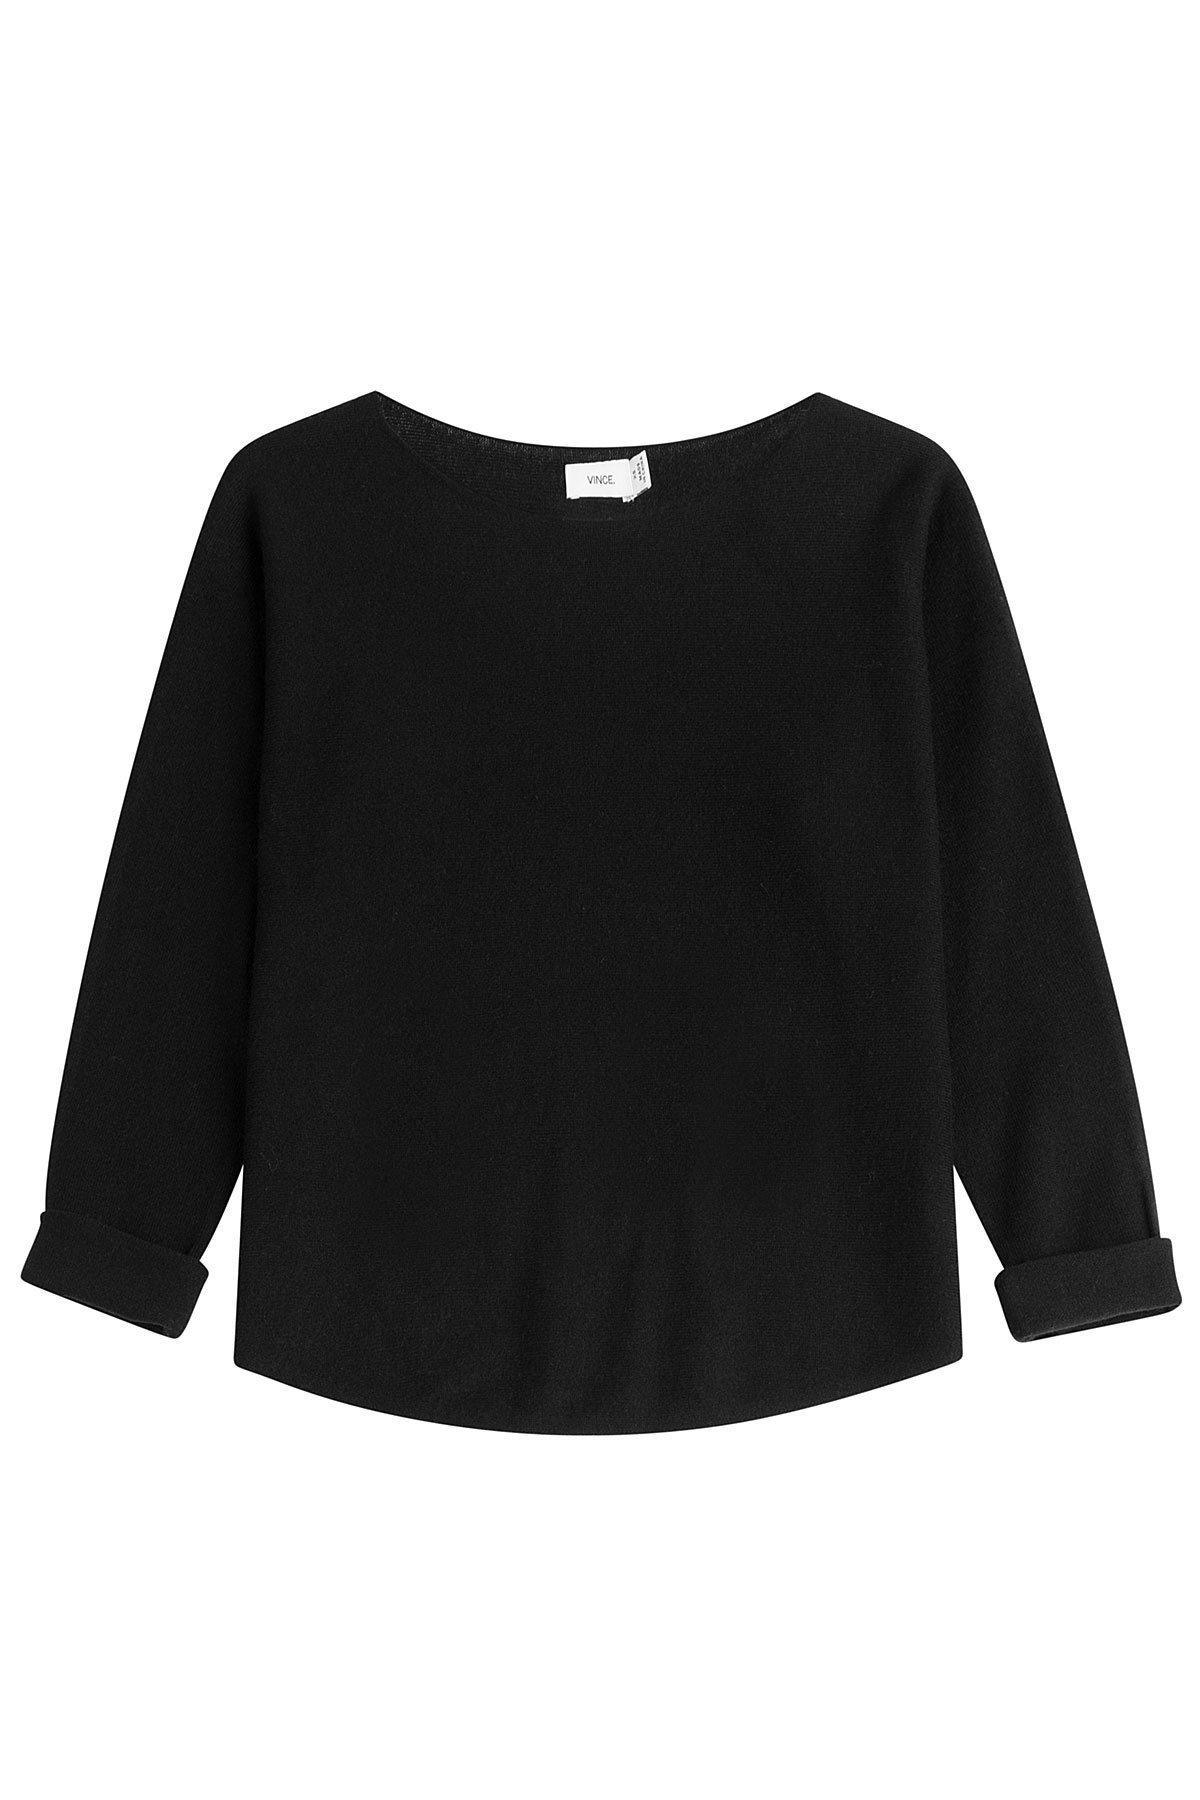 Cropped Boatneck Cashmere Pullover Gr. S